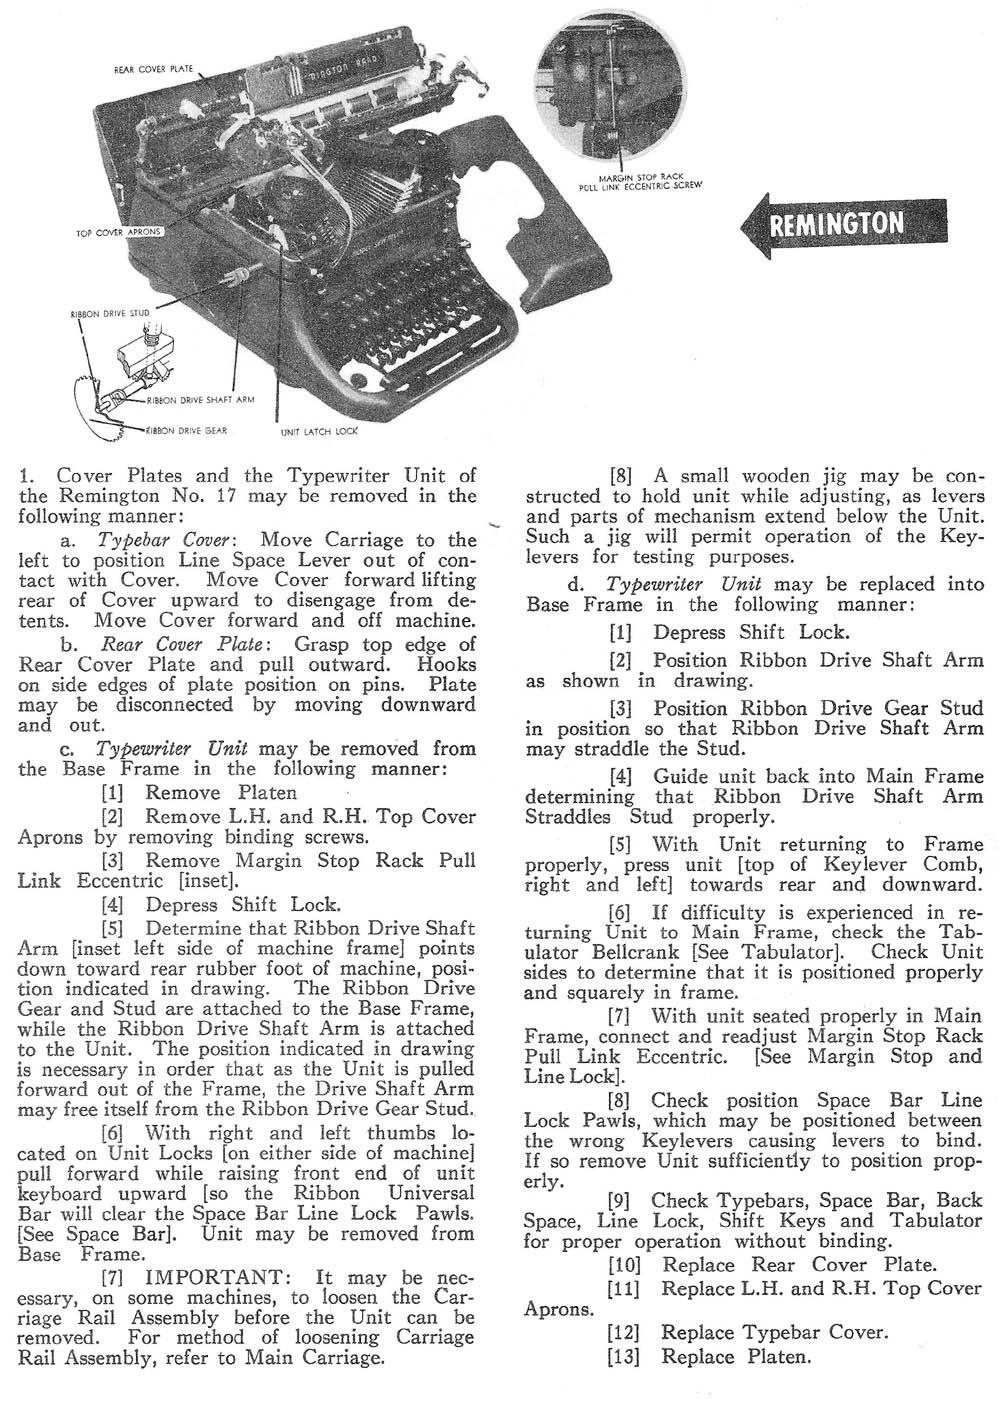 Cover Plates AMES OAMI Mechanical Training Manual